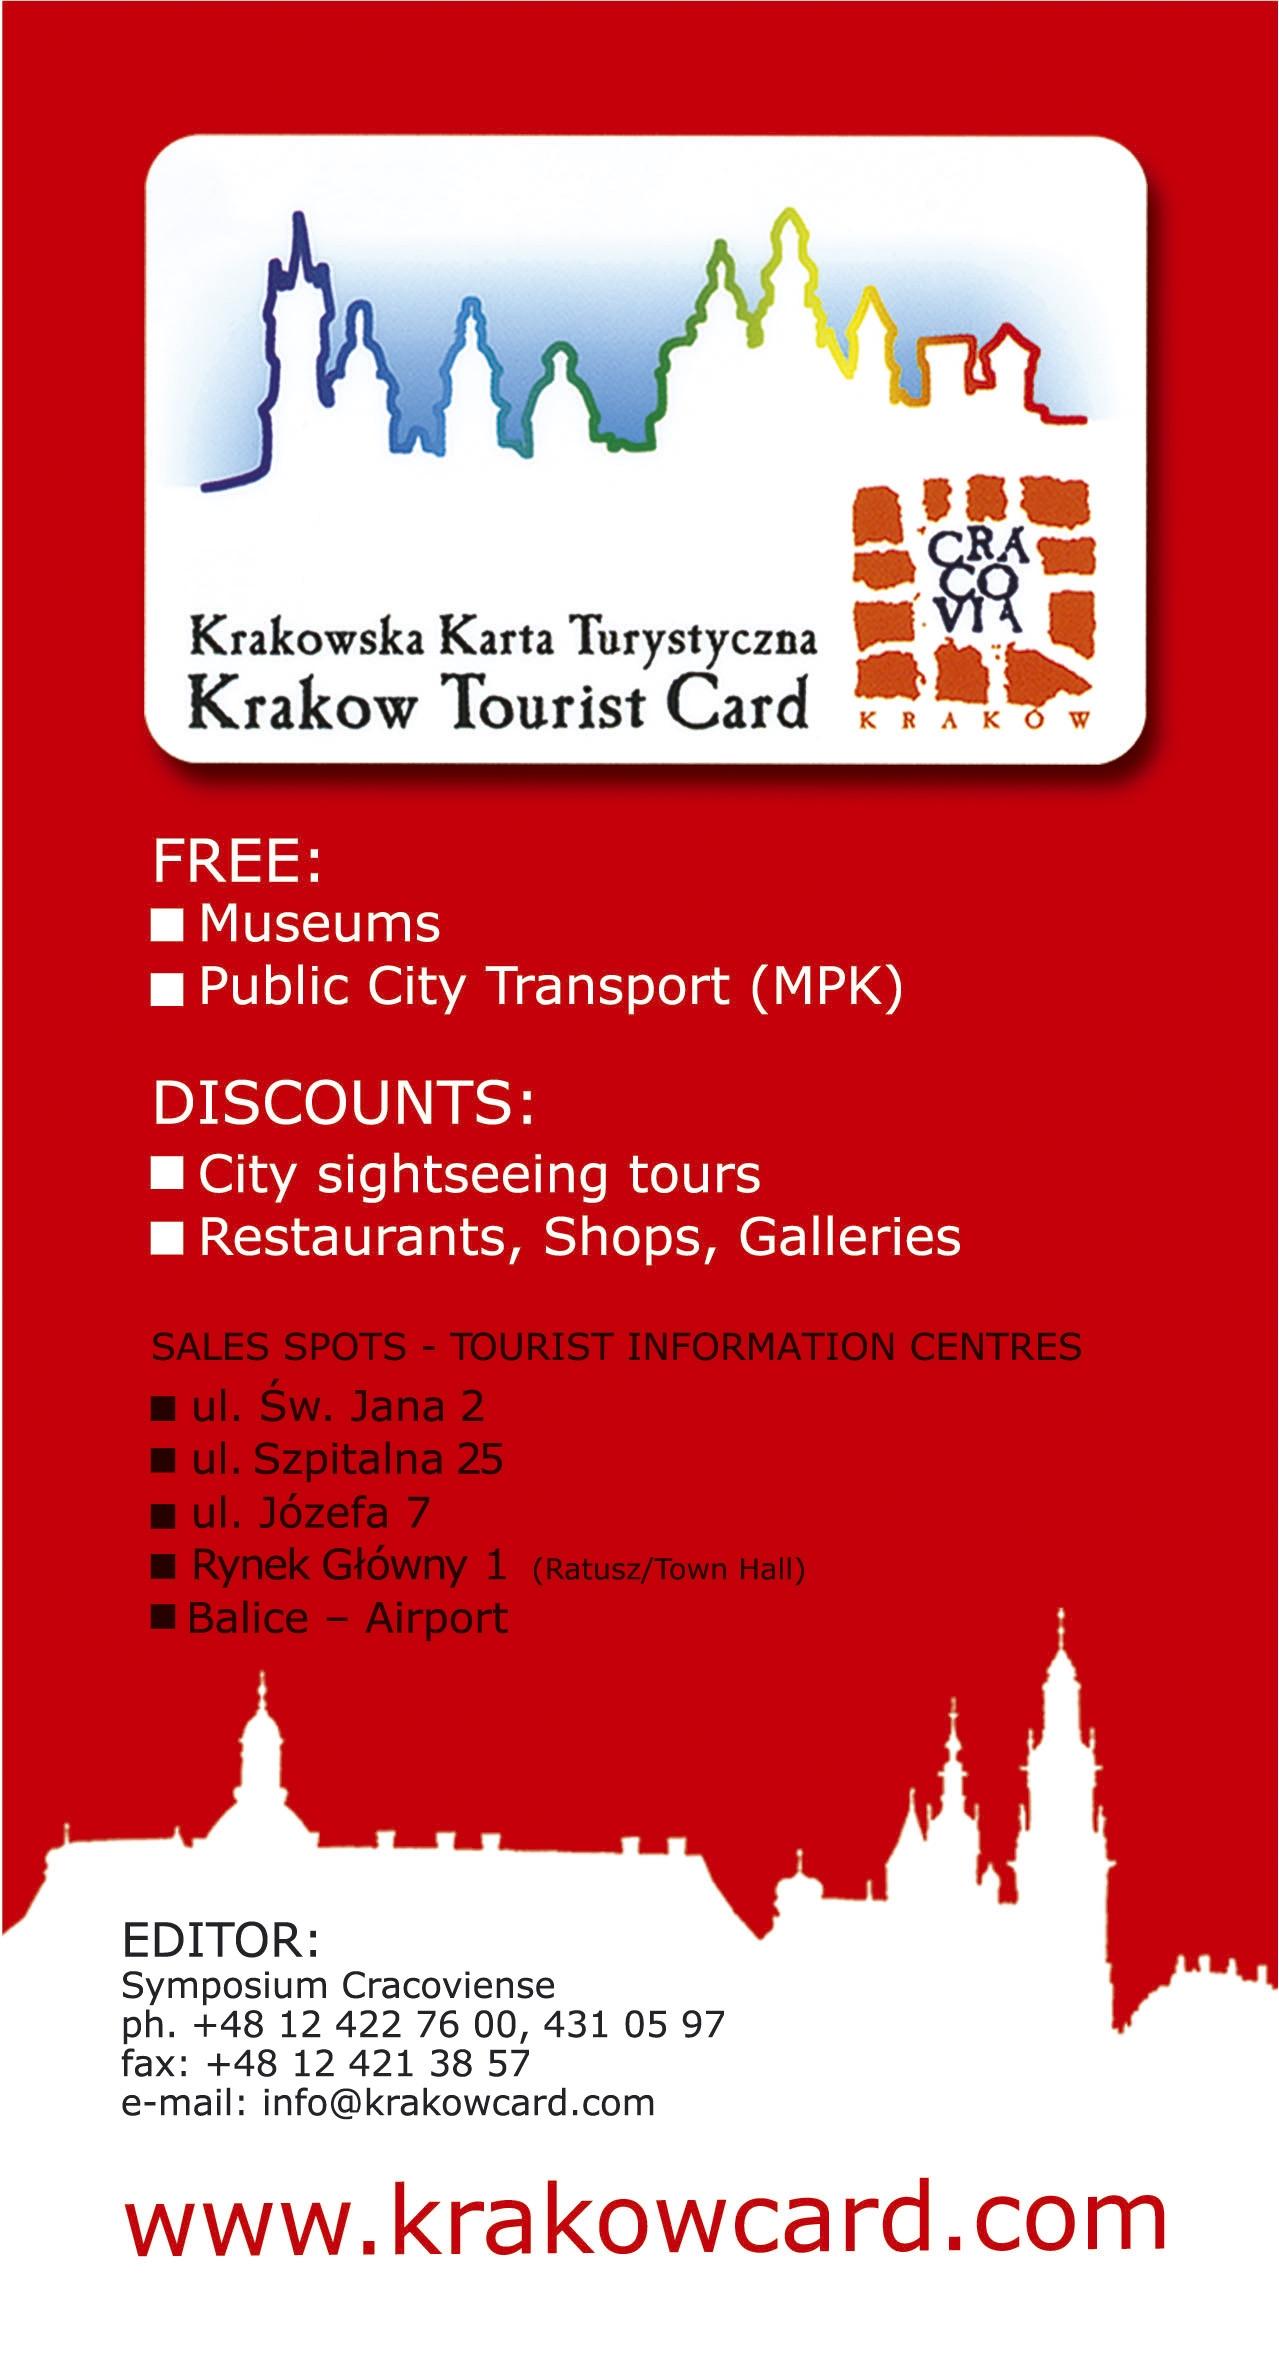 Krakowska Karta Turystyczna